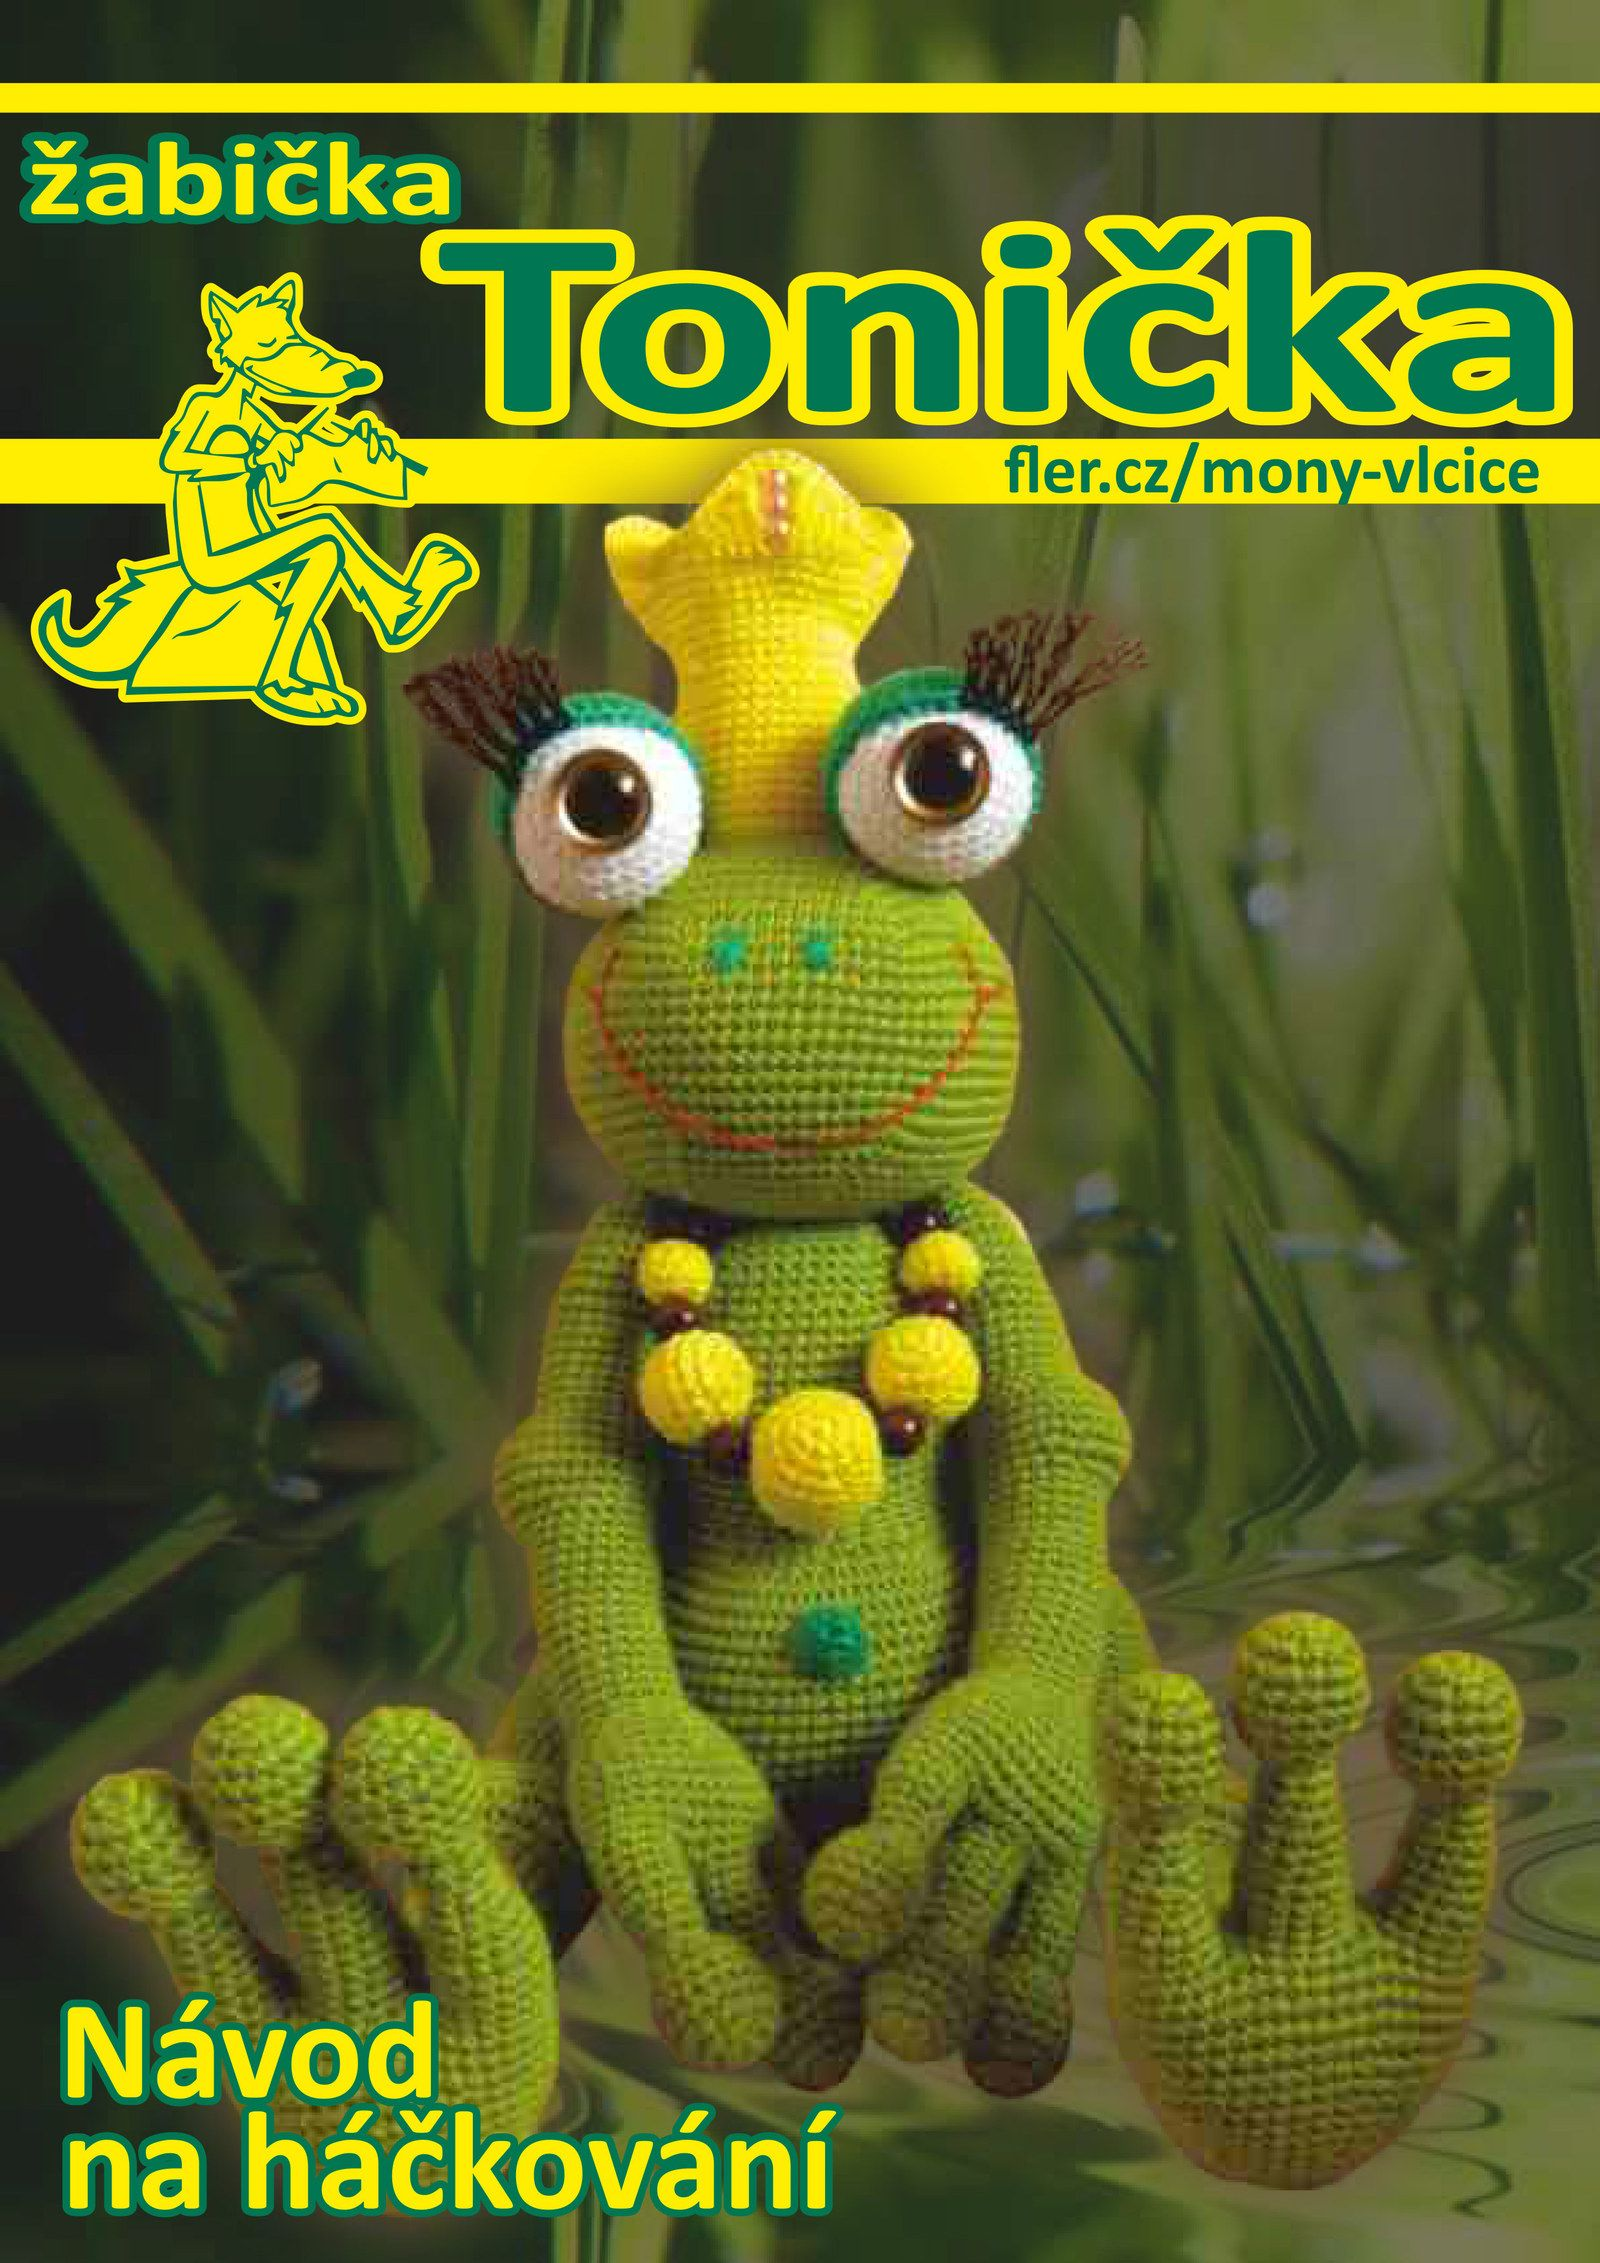 Háčkovaná žabička Tonička - návod   crochet   Pinterest   Häkeln